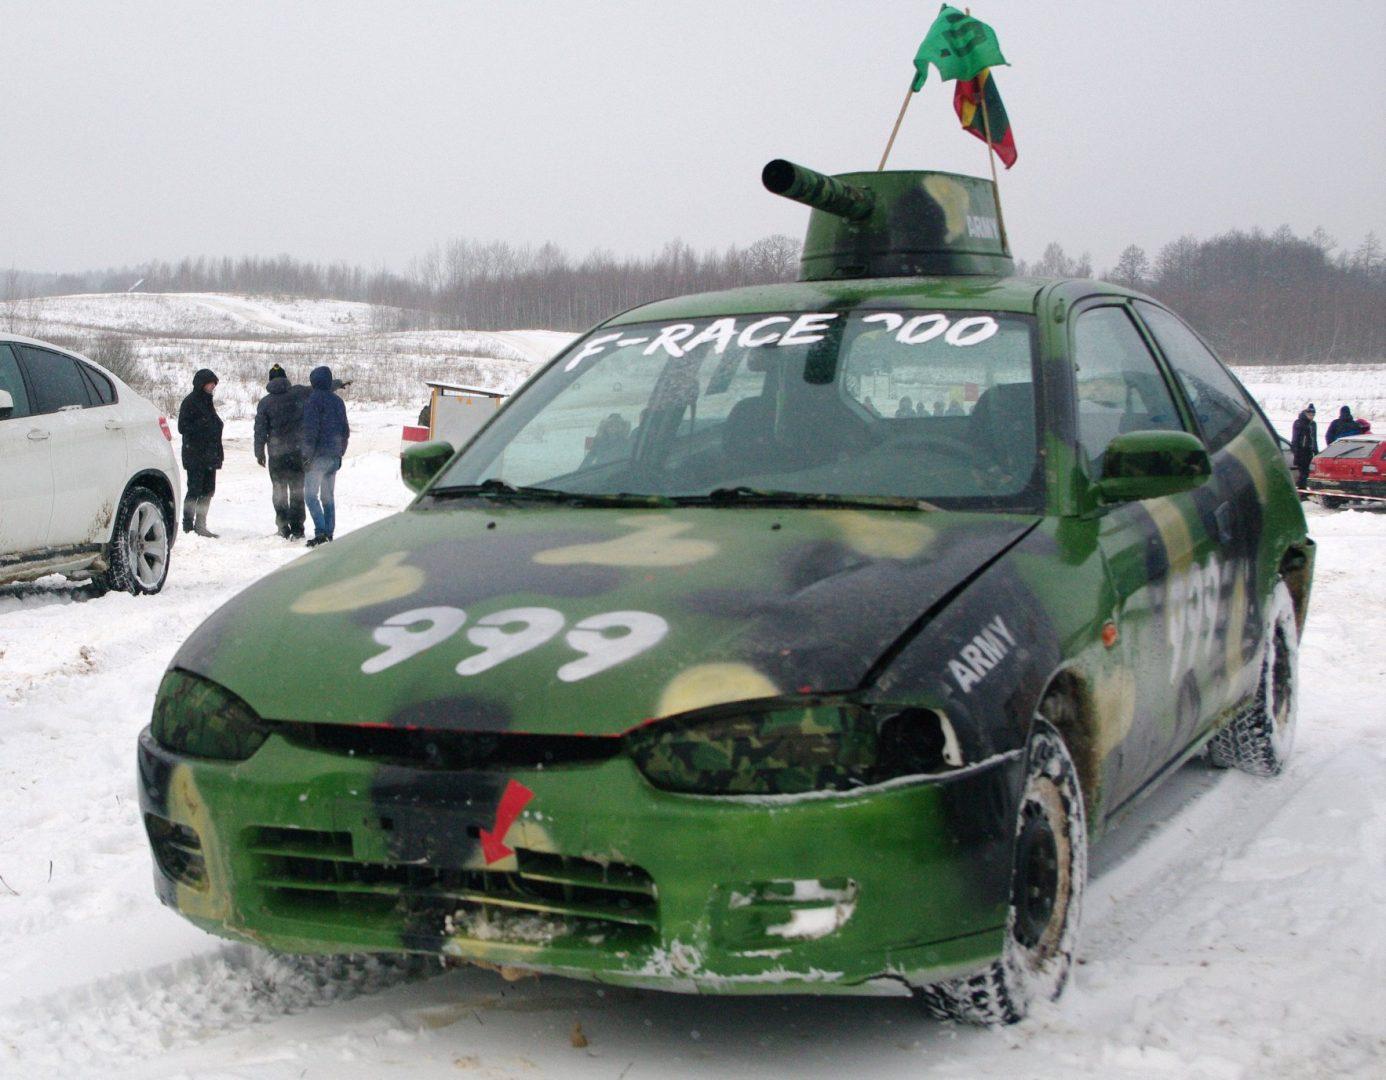 F-Race 200 Round VII